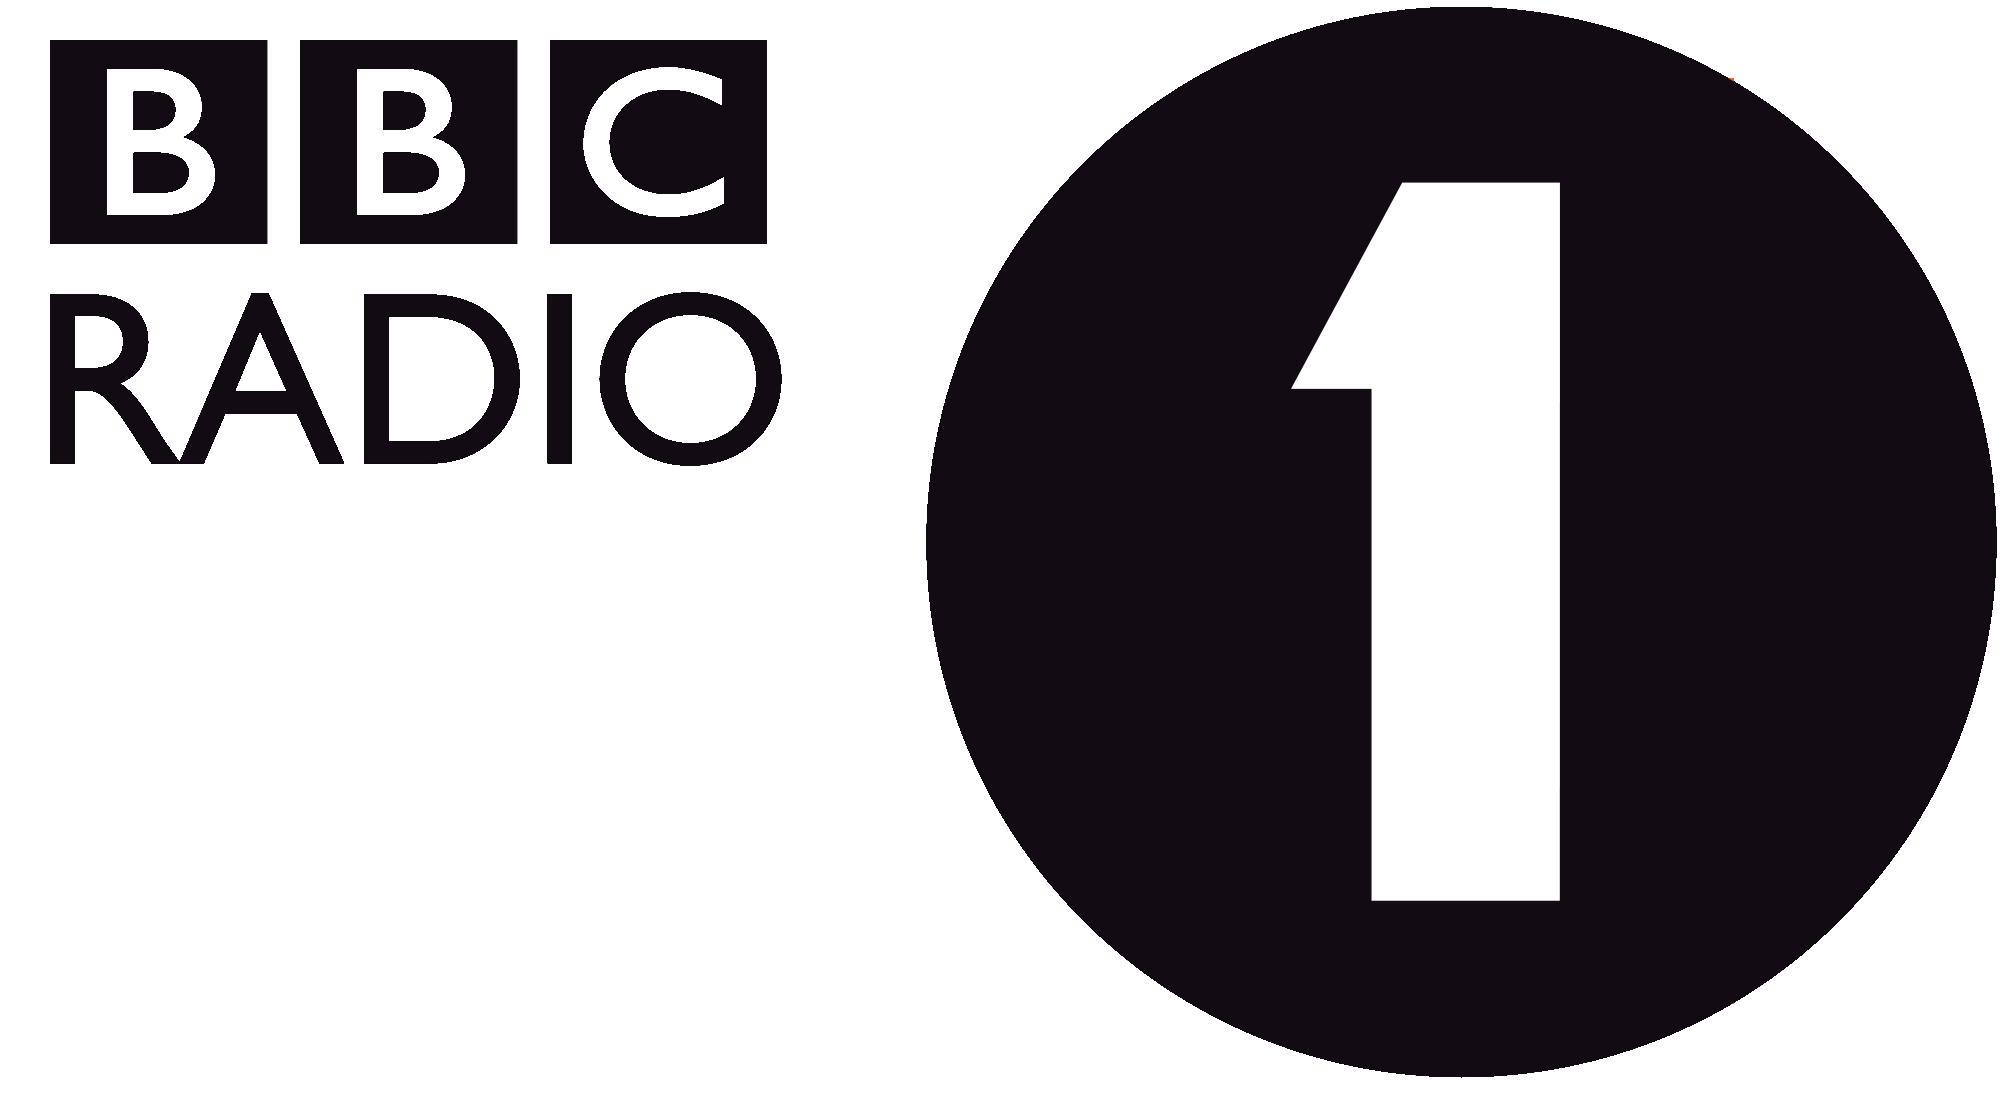 radio one Radio one 91fm, dunedin, new zealand 10k likes dunedin's student radio  station, championing the independent & alternative since 1984.